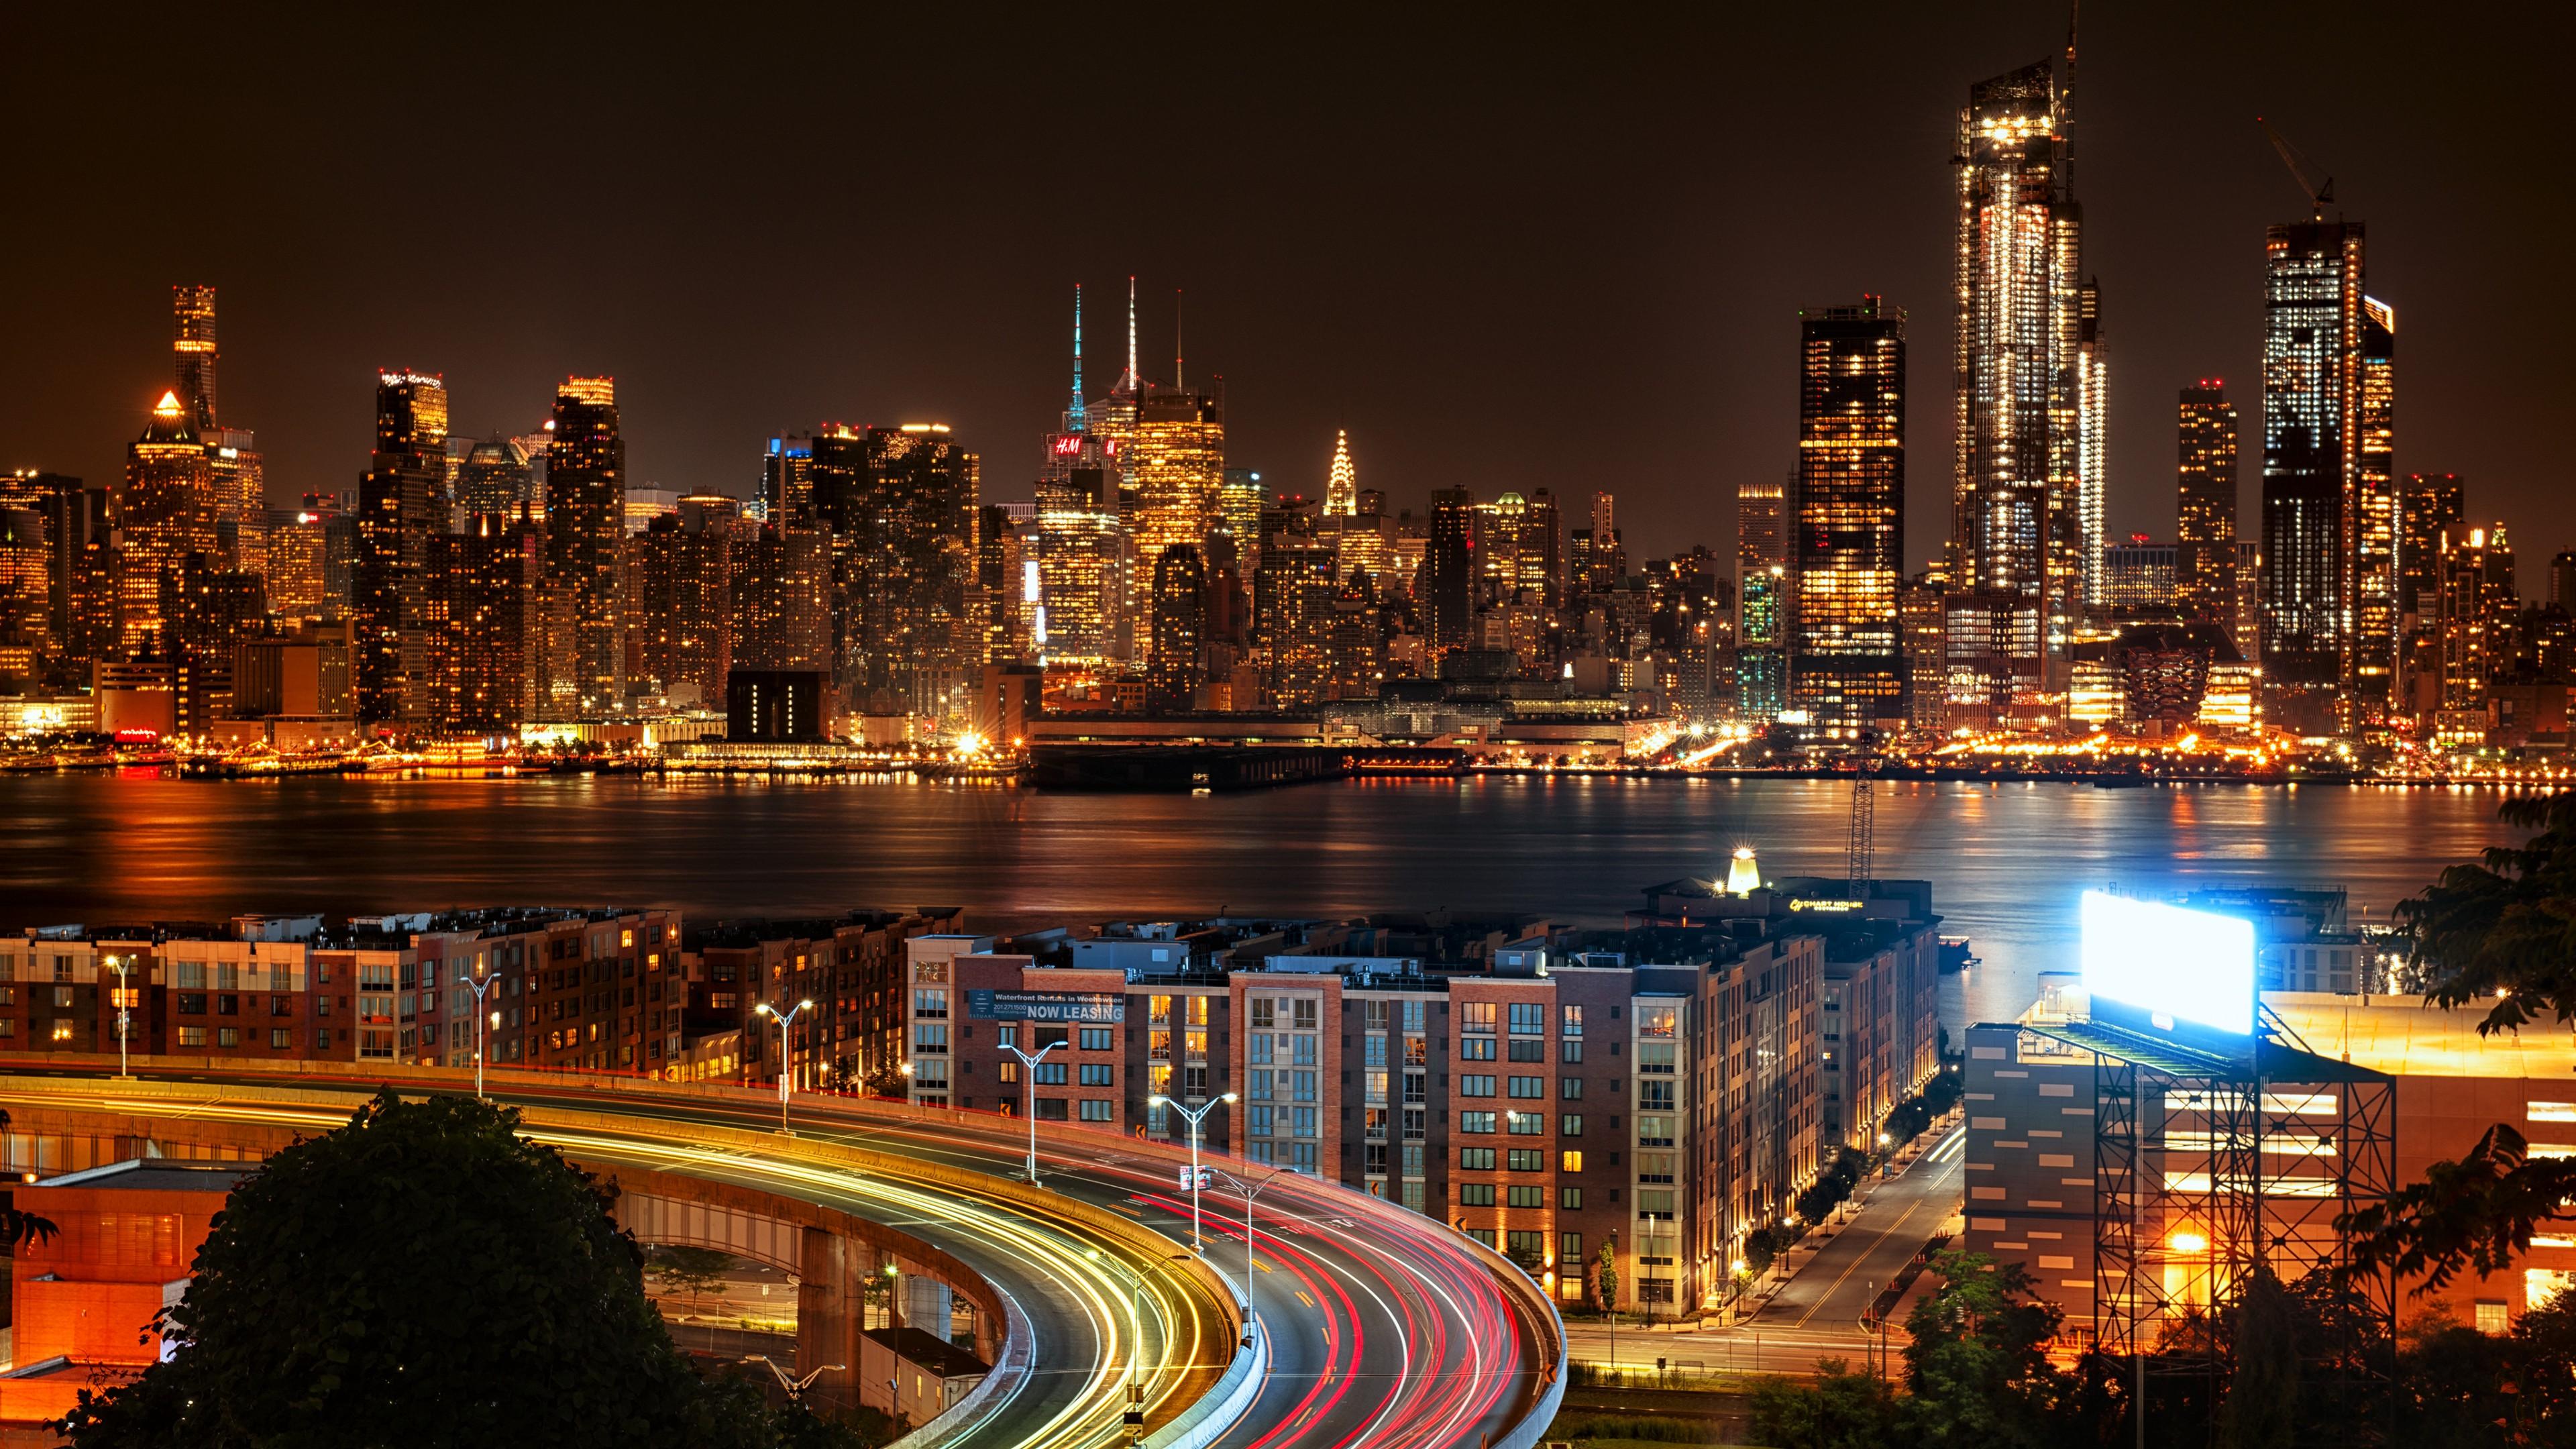 new york wallpaper 4k,cityscape,city,metropolitan area,skyline,urban area